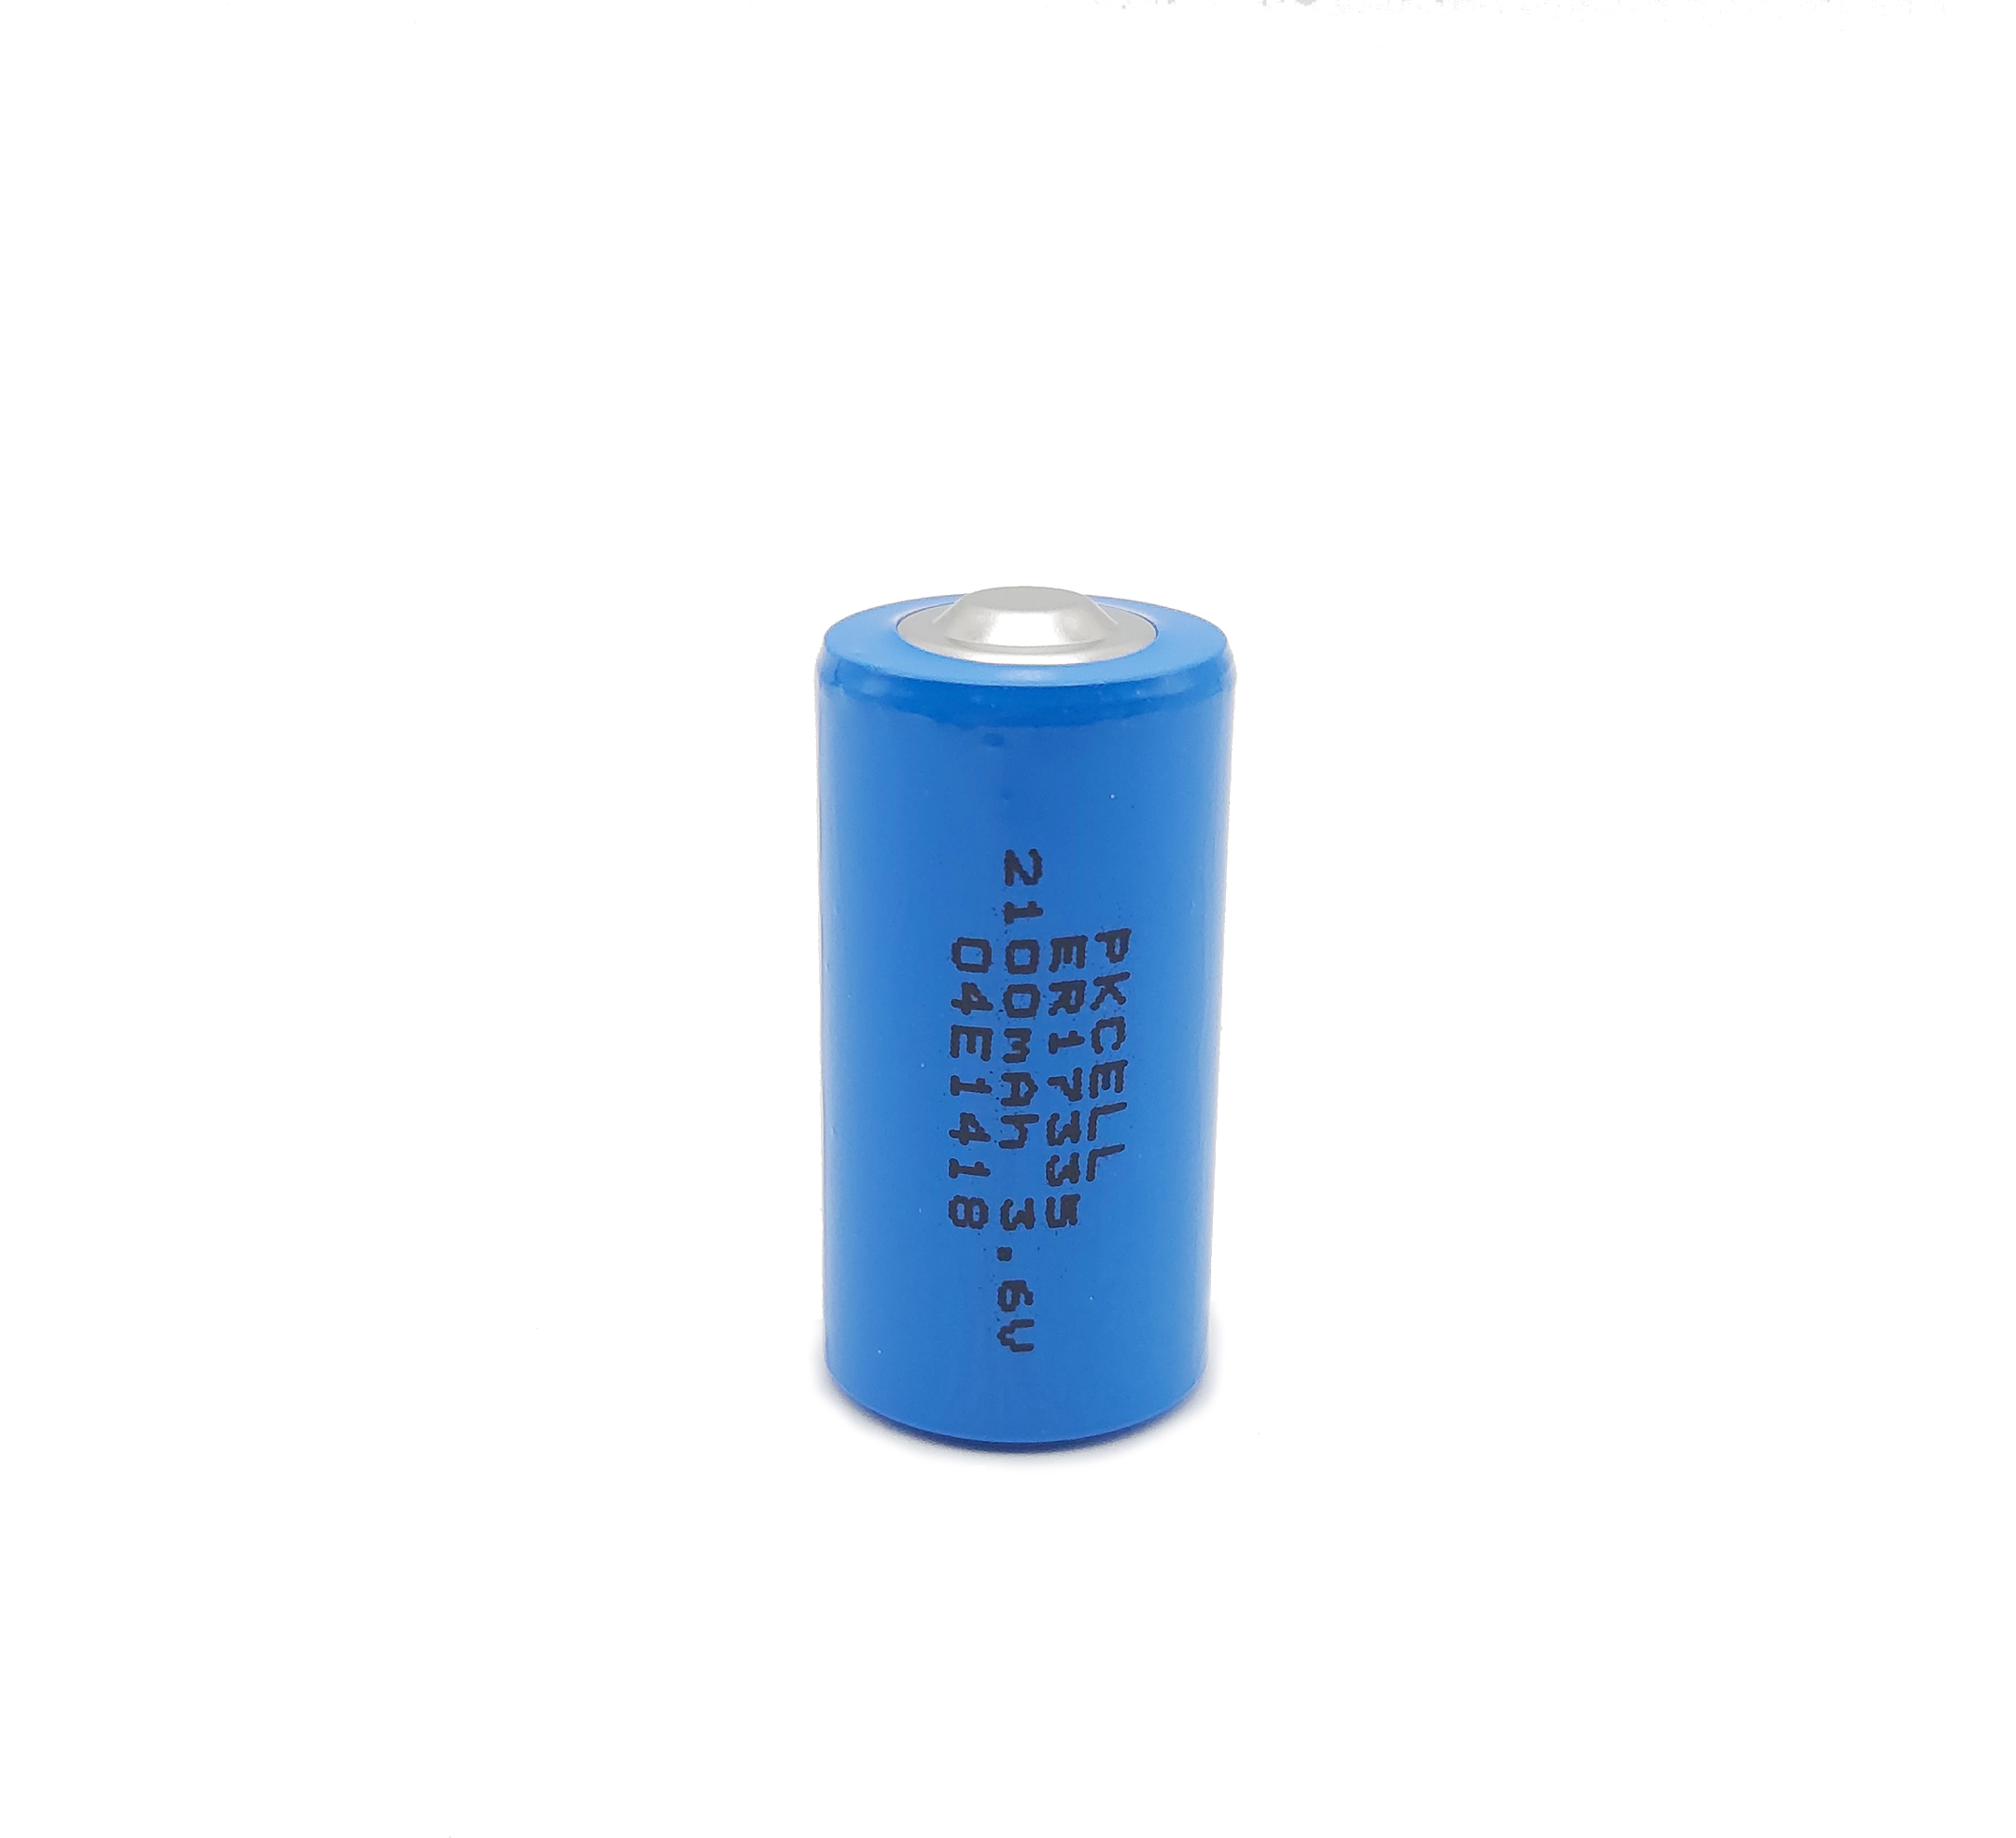 https://media.picotronic.de/products/ds_picture/lightbox/BATTERIE-ELOCK-ER17335.jpg